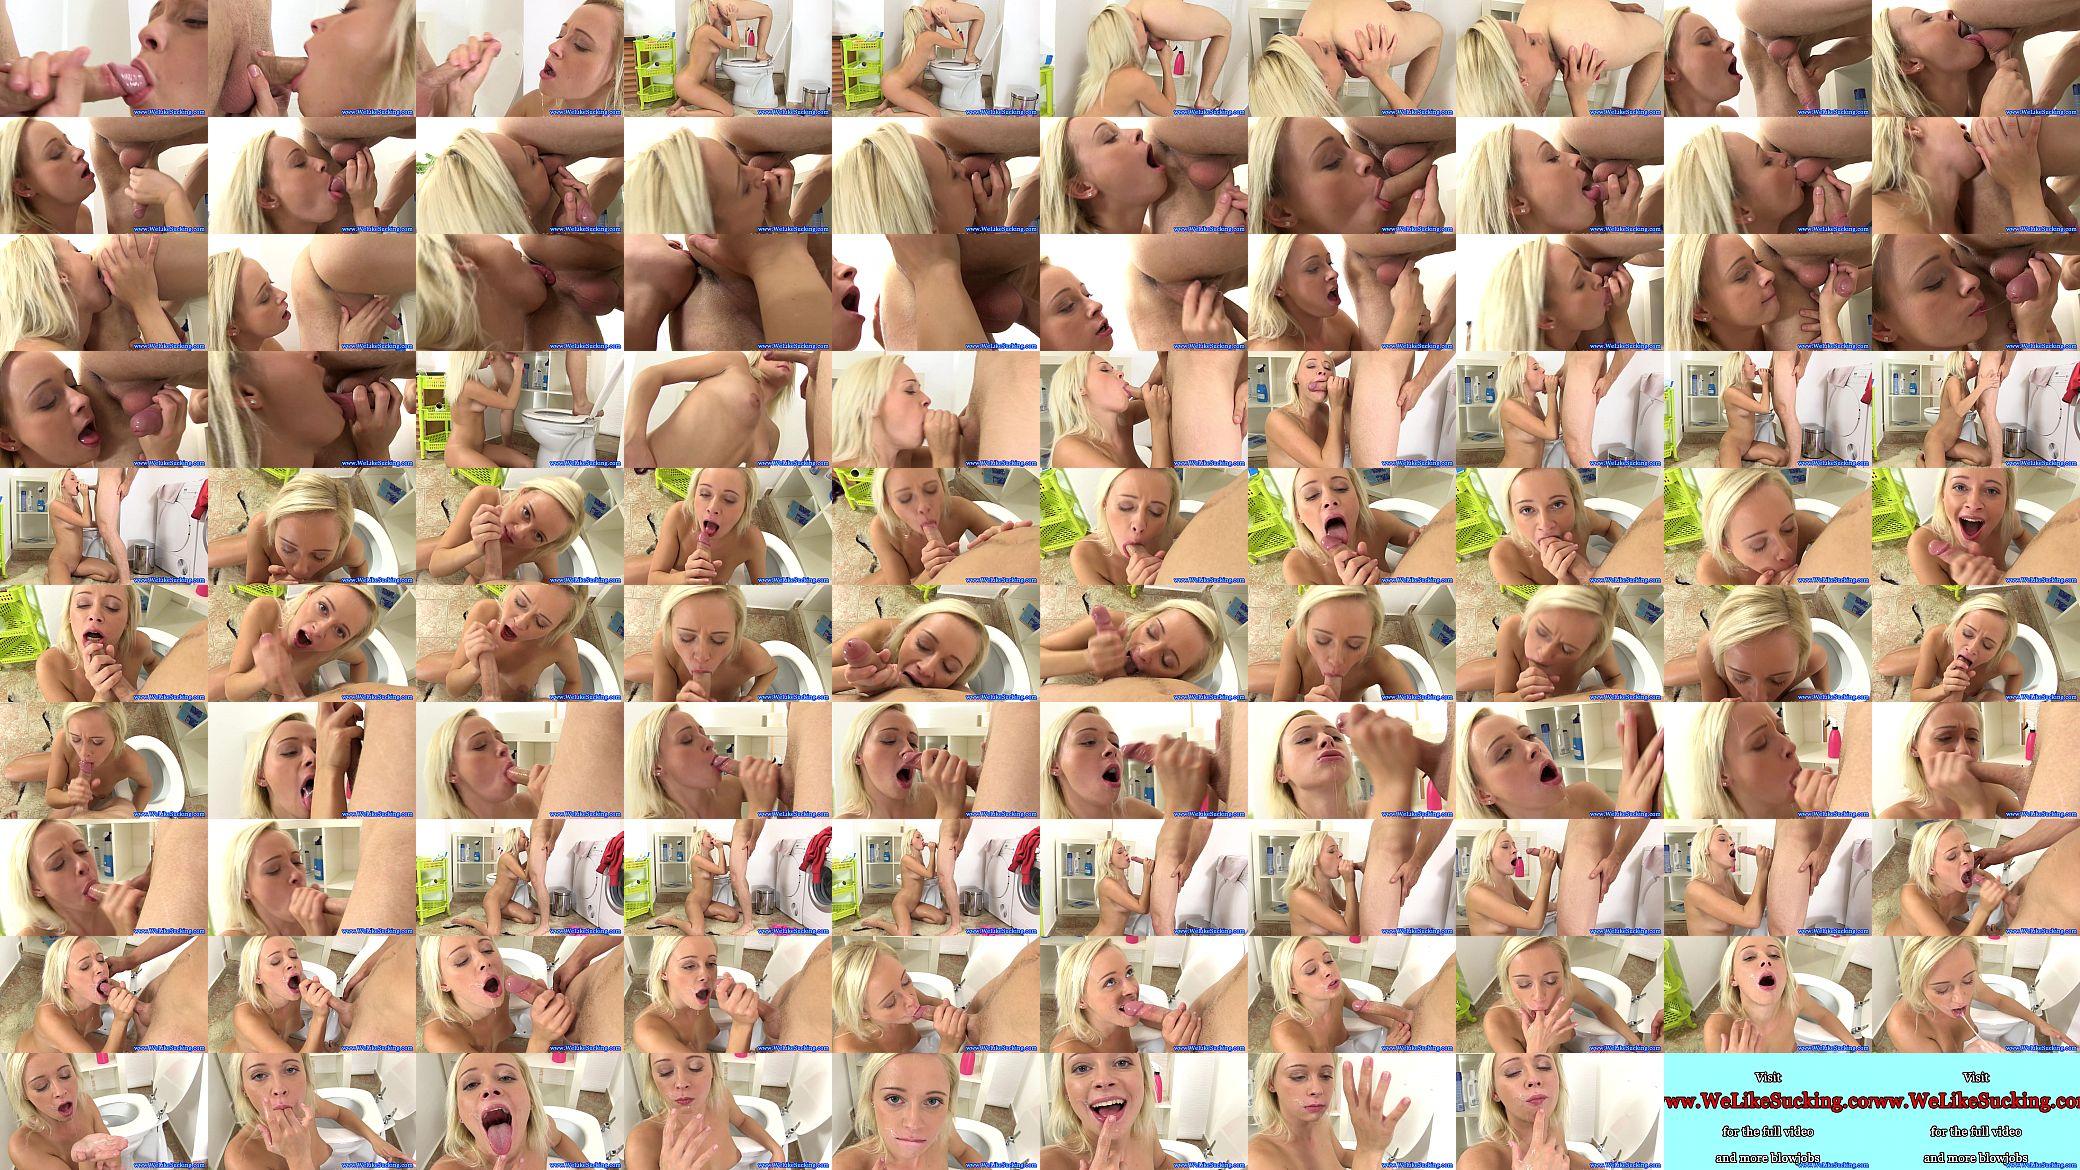 Dicksucking loving blonde handles dick